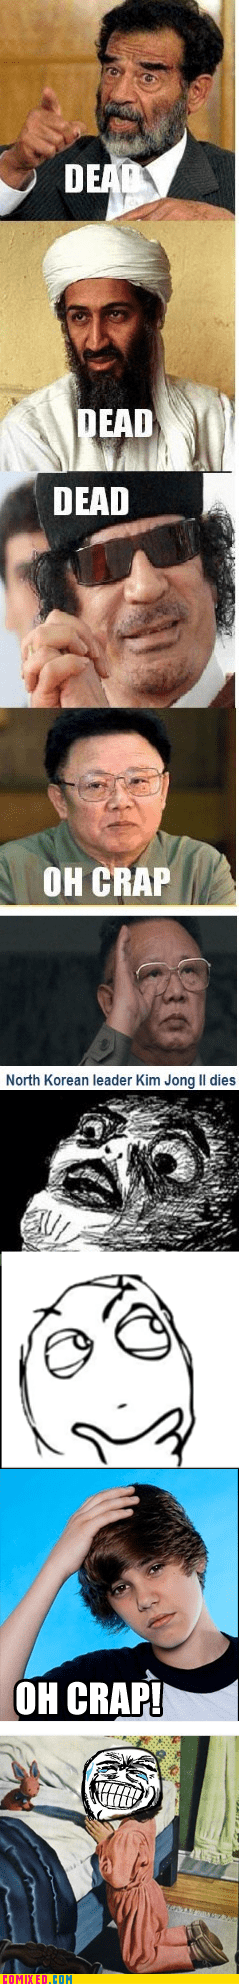 best of week,dead,justin bieber,Kim Jong-Il,oh crap,the internets